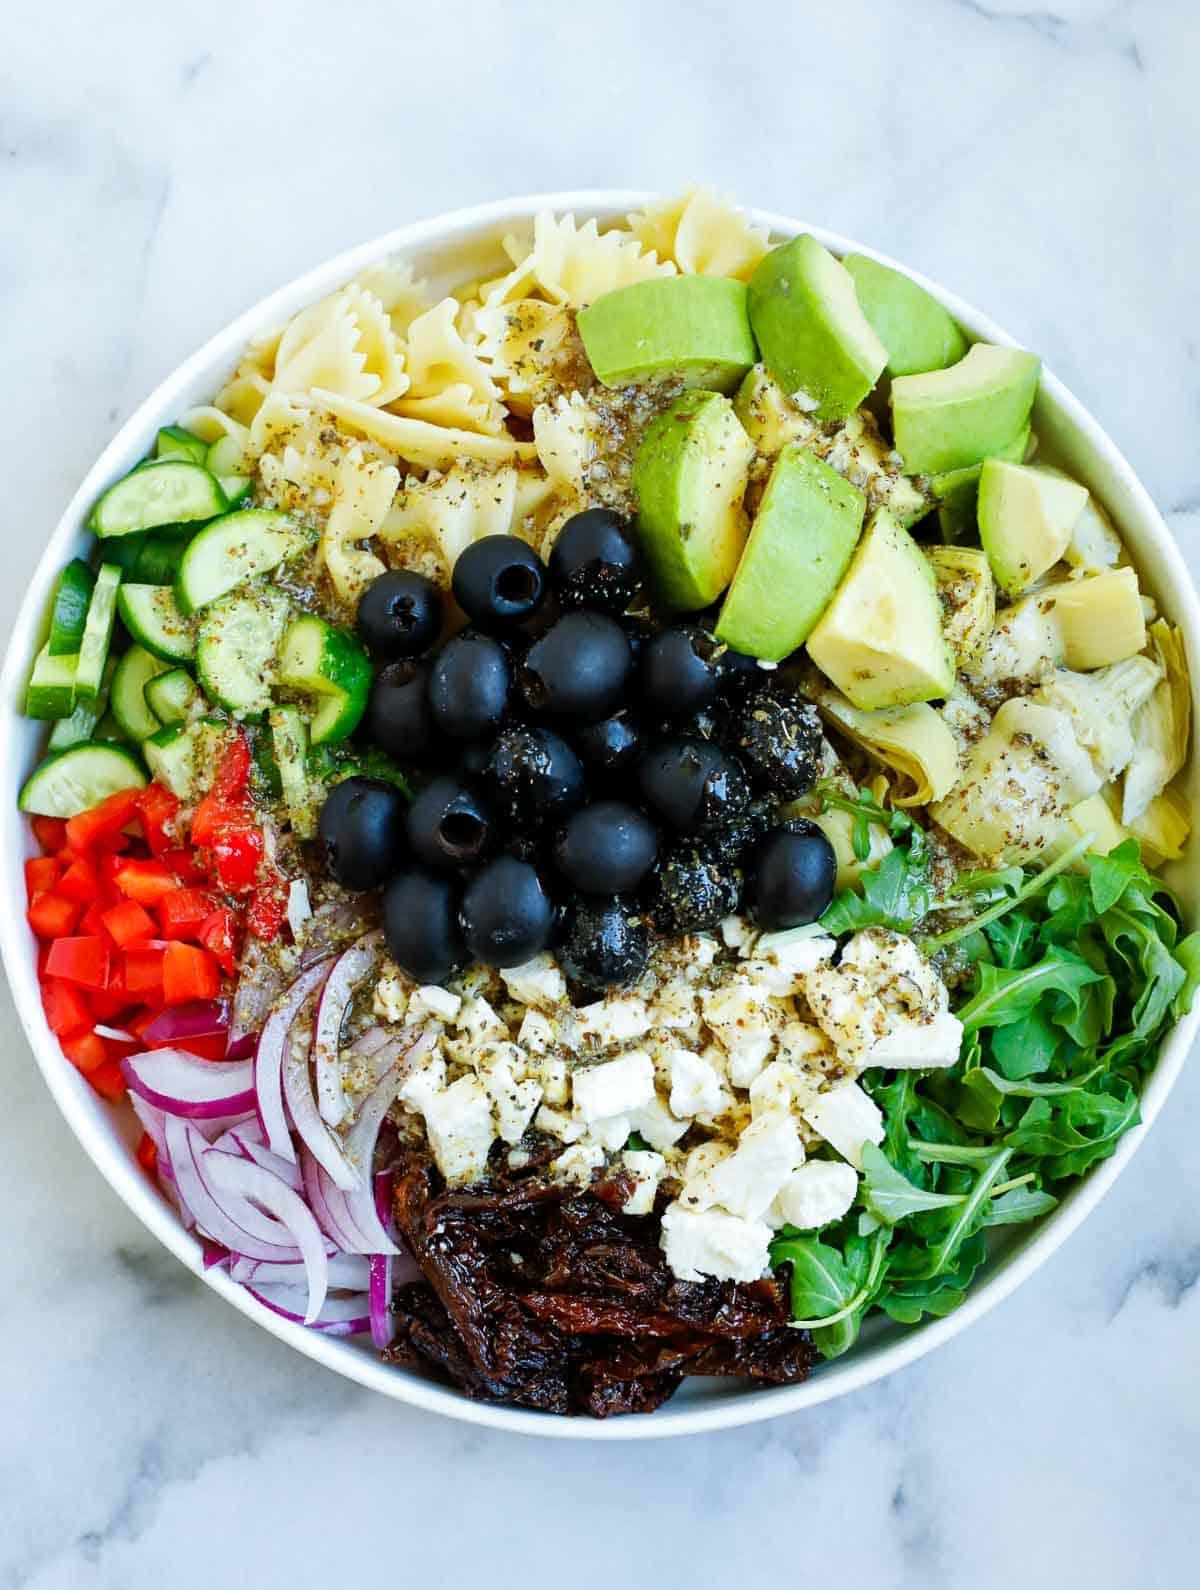 Salad dressing added to a bowl of Mediterranean salad.